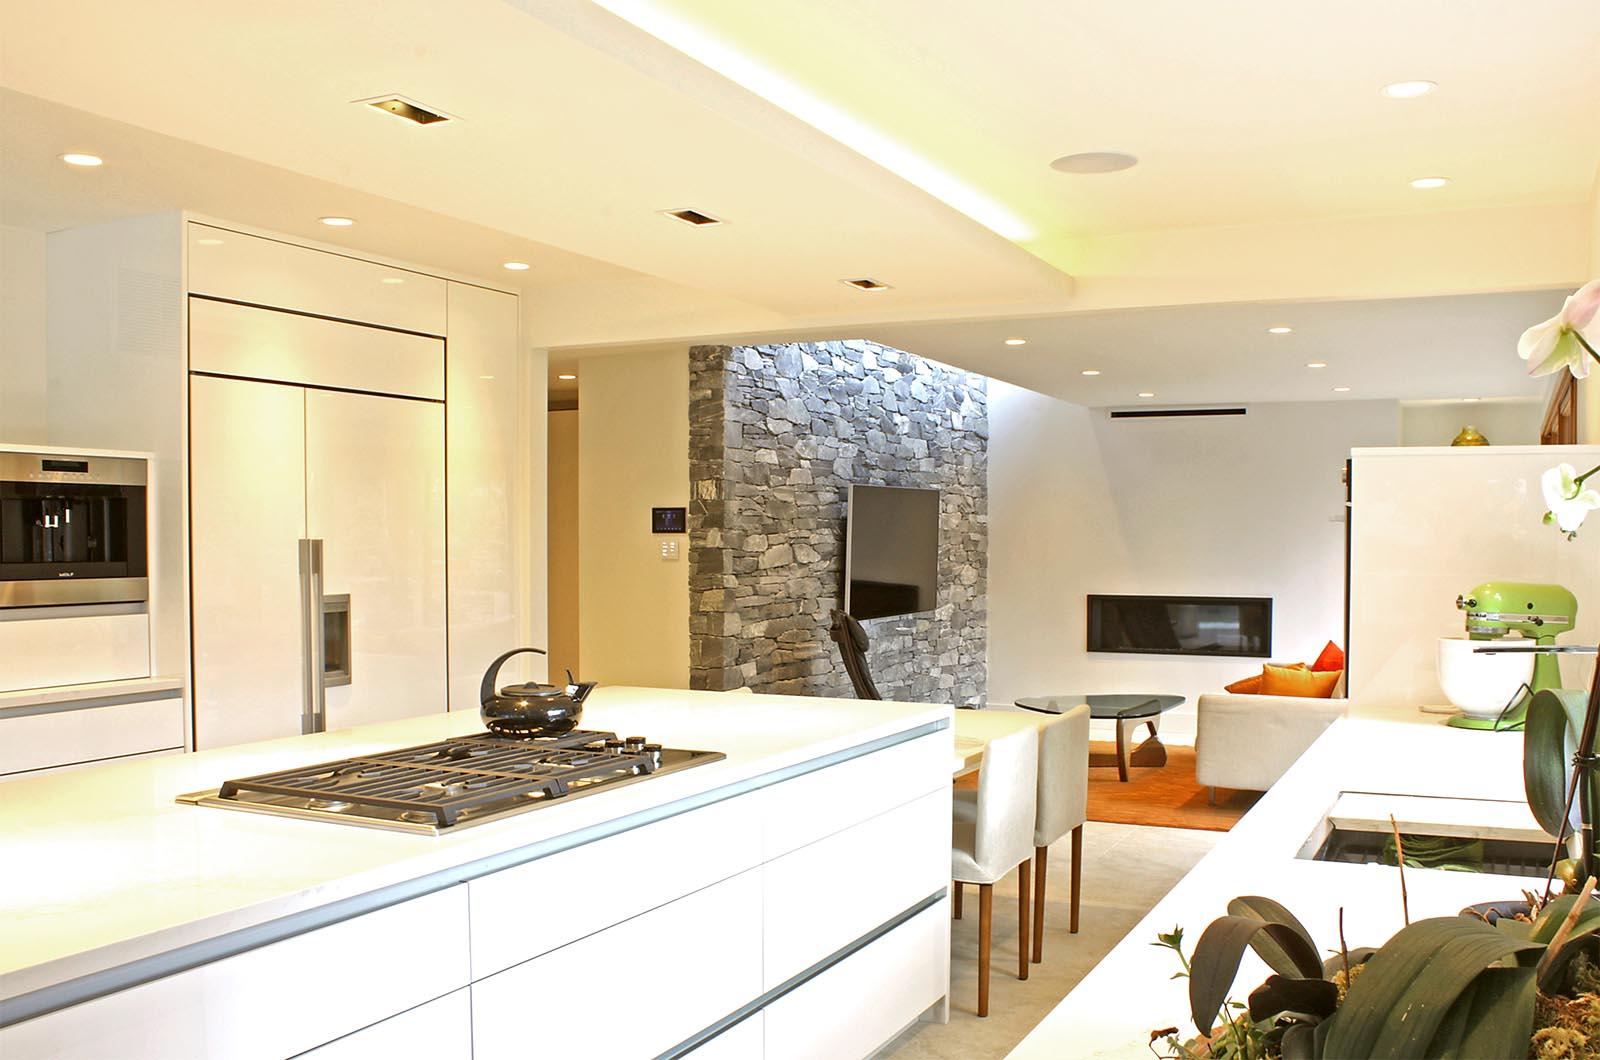 J Norris Construction - Bespoke kitchen design